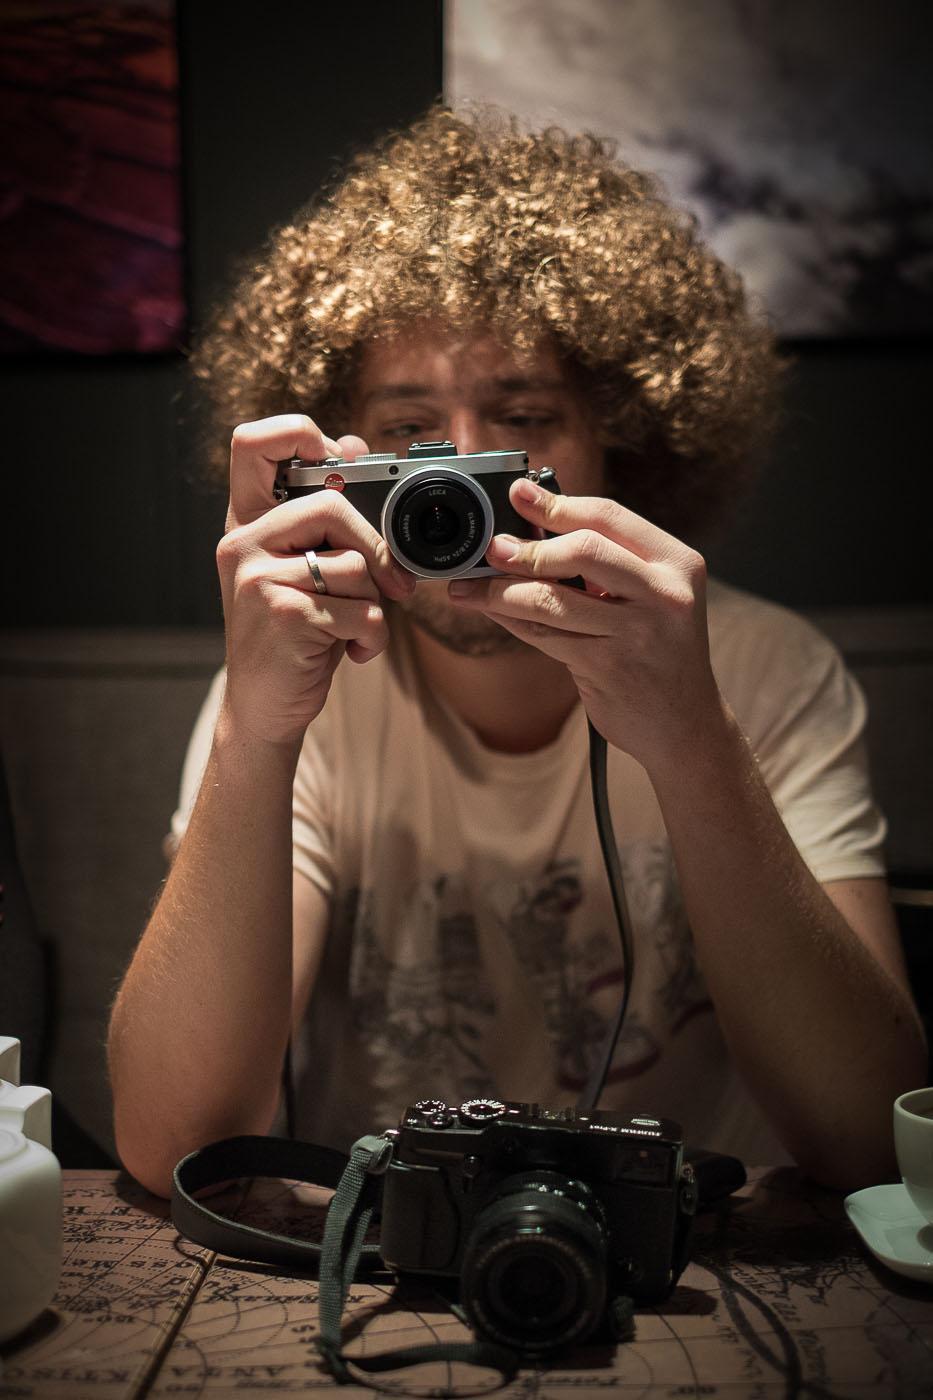 Илья Варламов перешёл на Leica